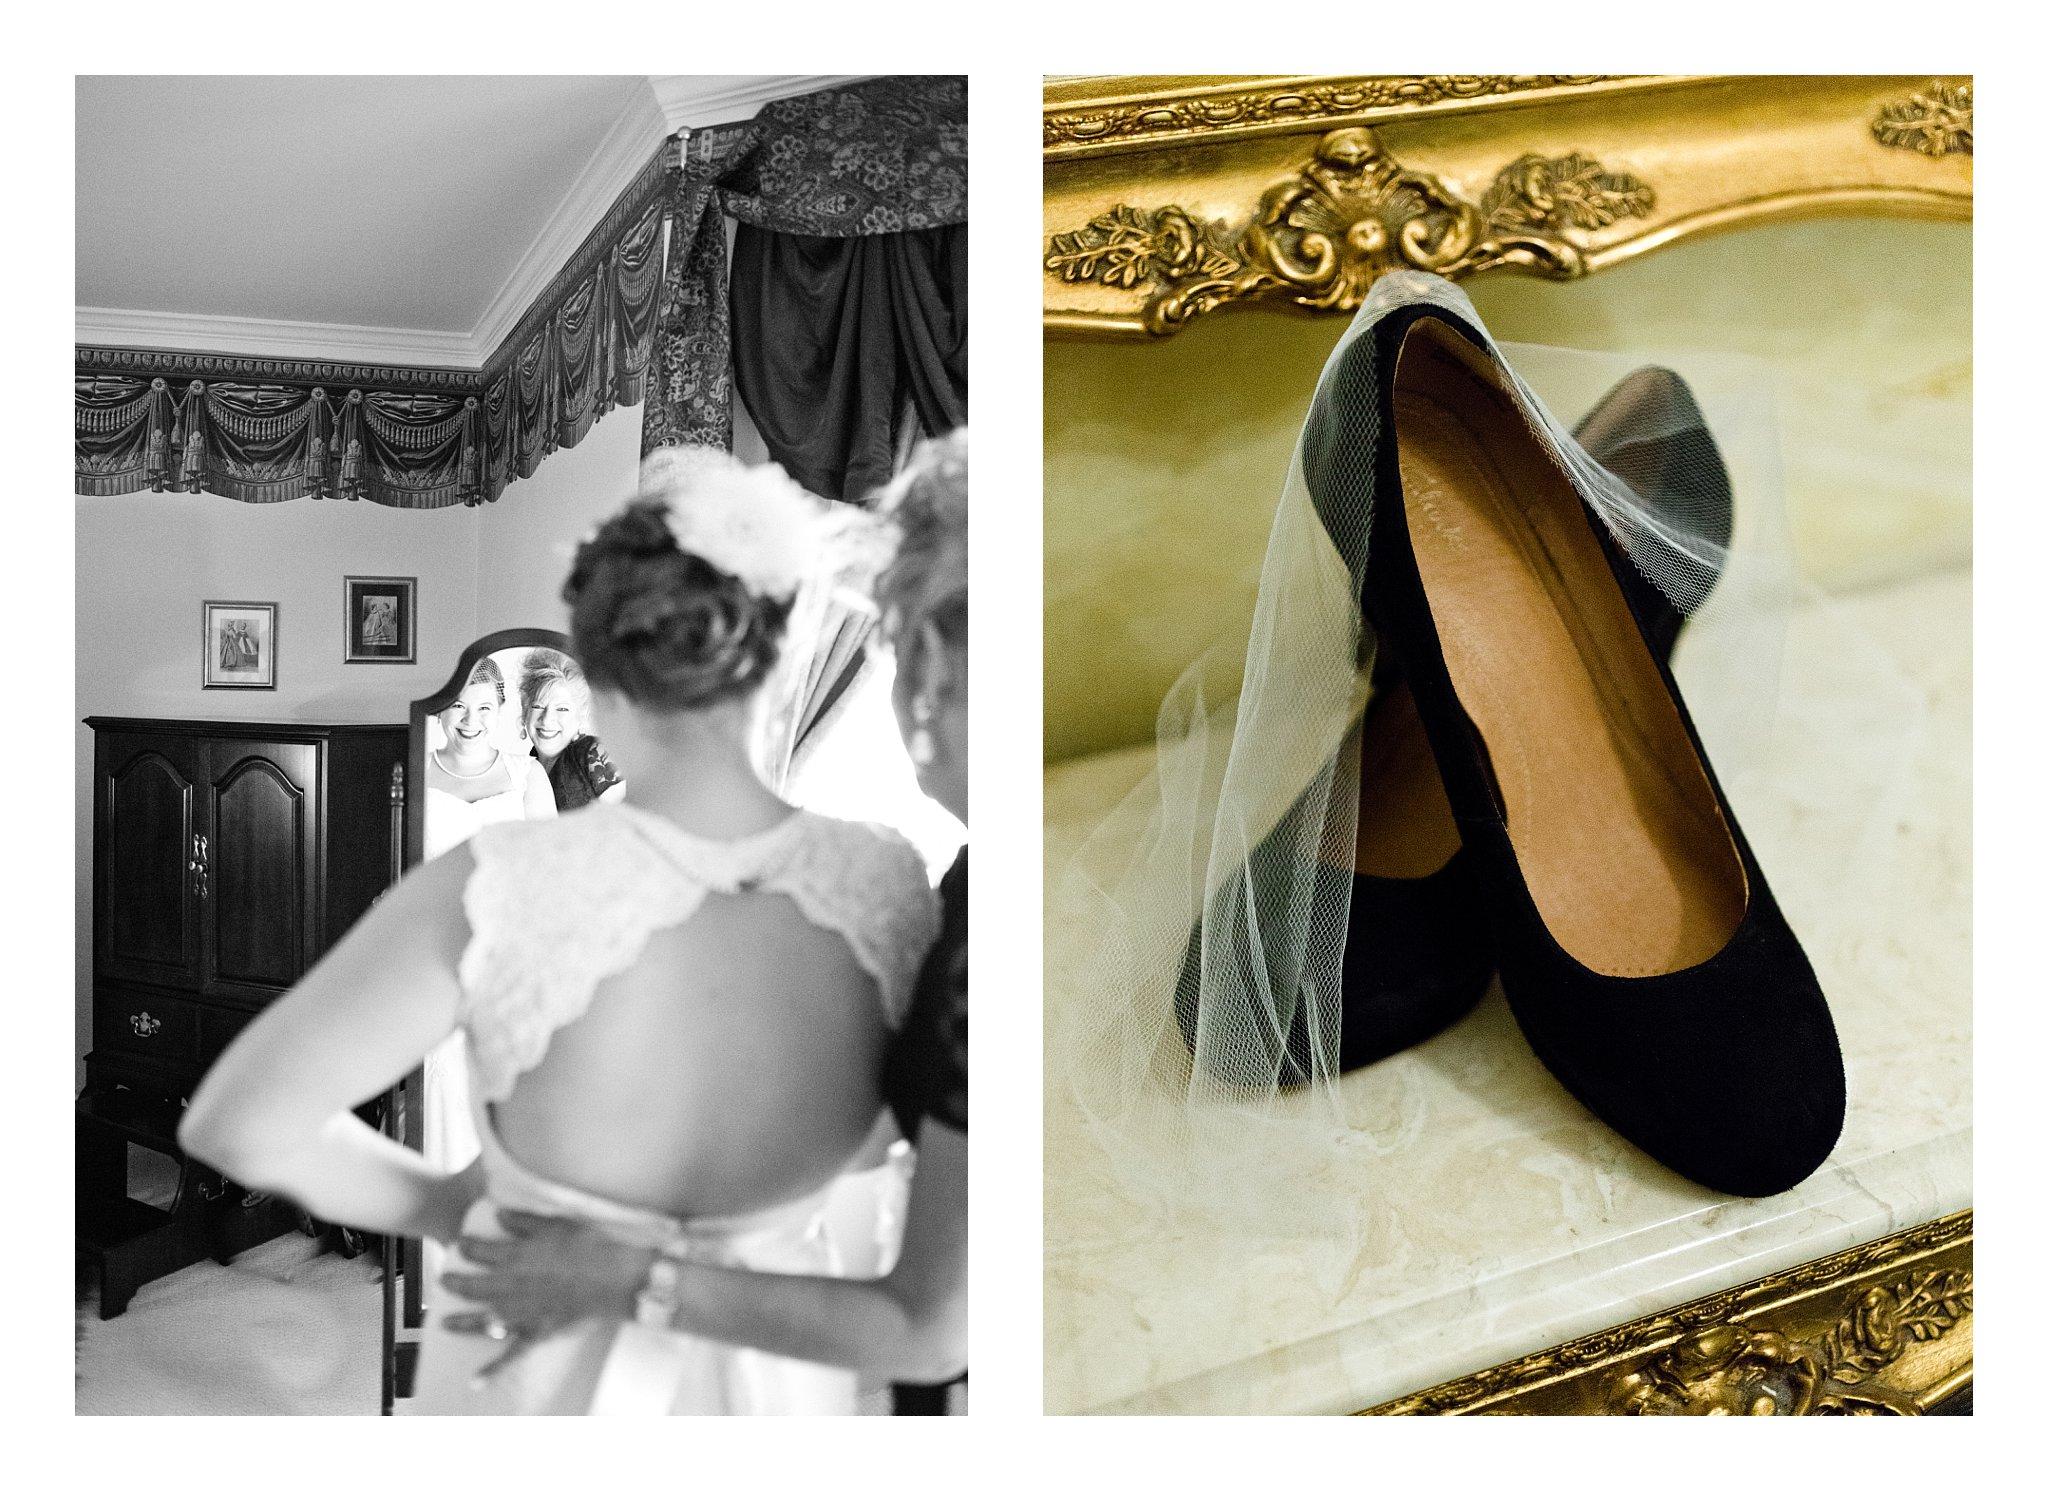 cypress-inn-garnet-black-lowcountry-vintage-wedding-conway-sc-photos_0139.jpg